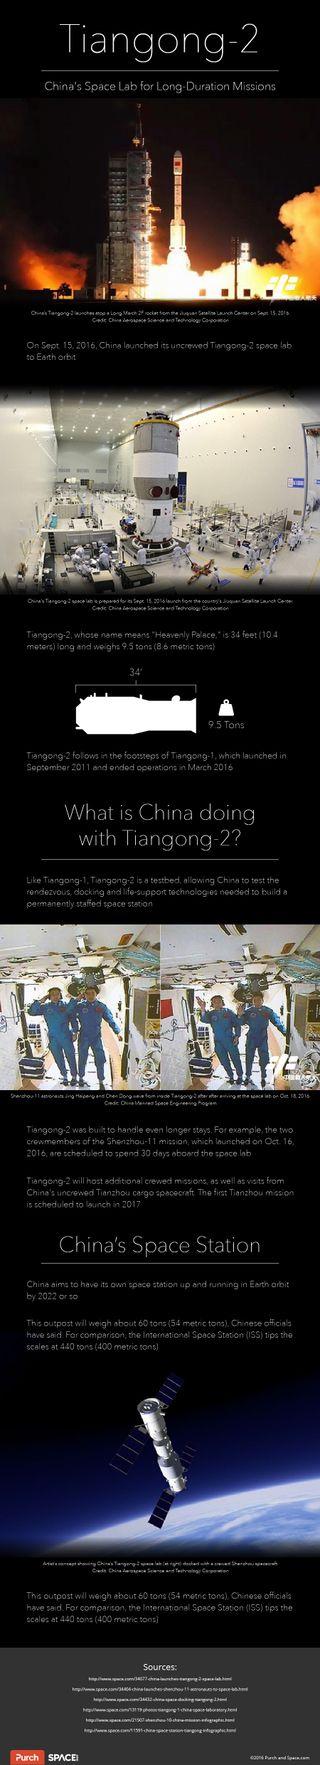 Tiangong-2 Infographic